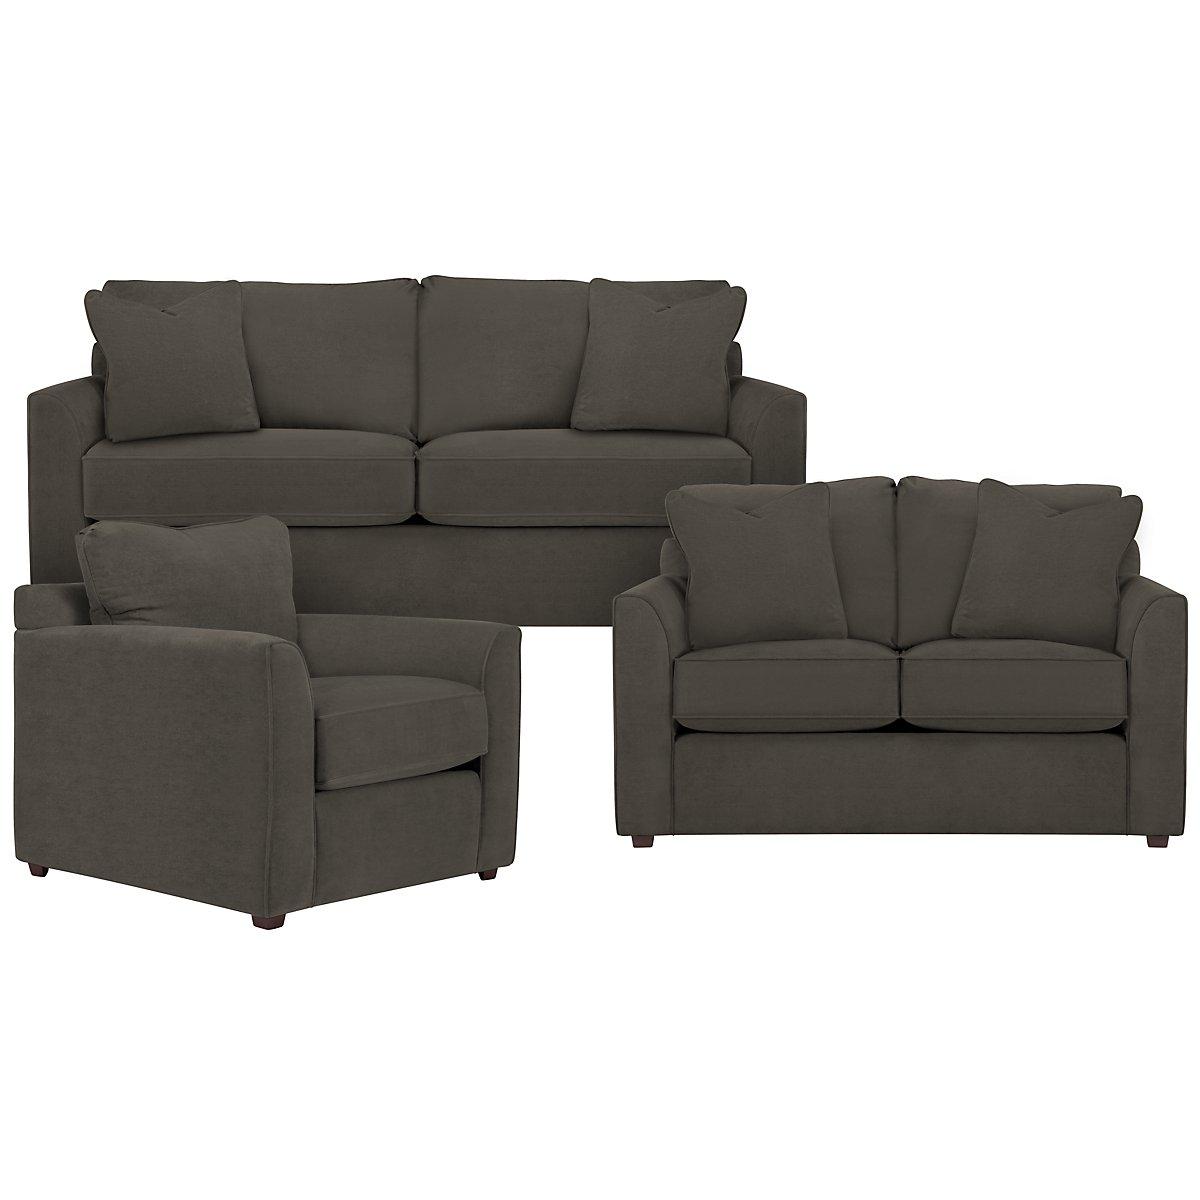 Express3 Dark Gray Microfiber Living Room